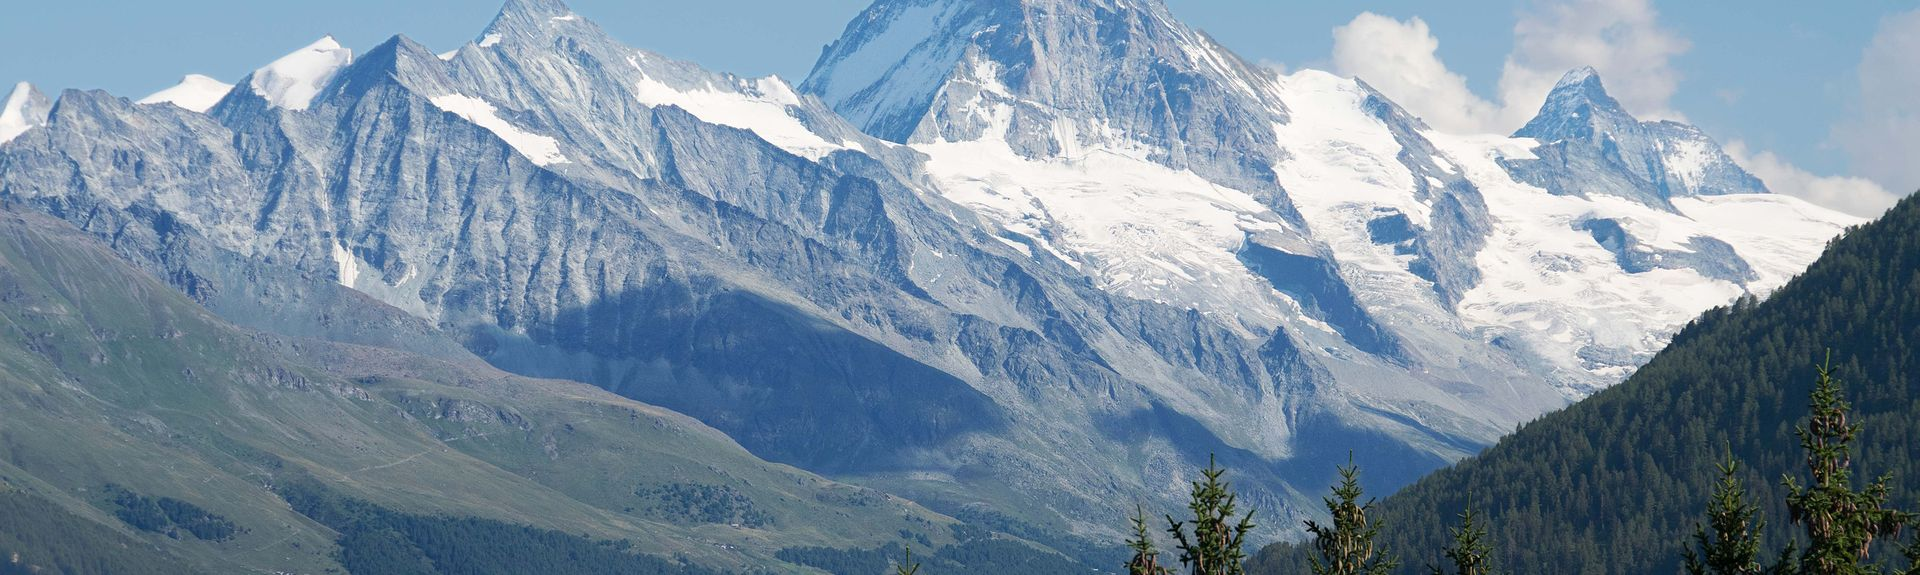 Randogne, Crans-Montana, Valais, Switzerland